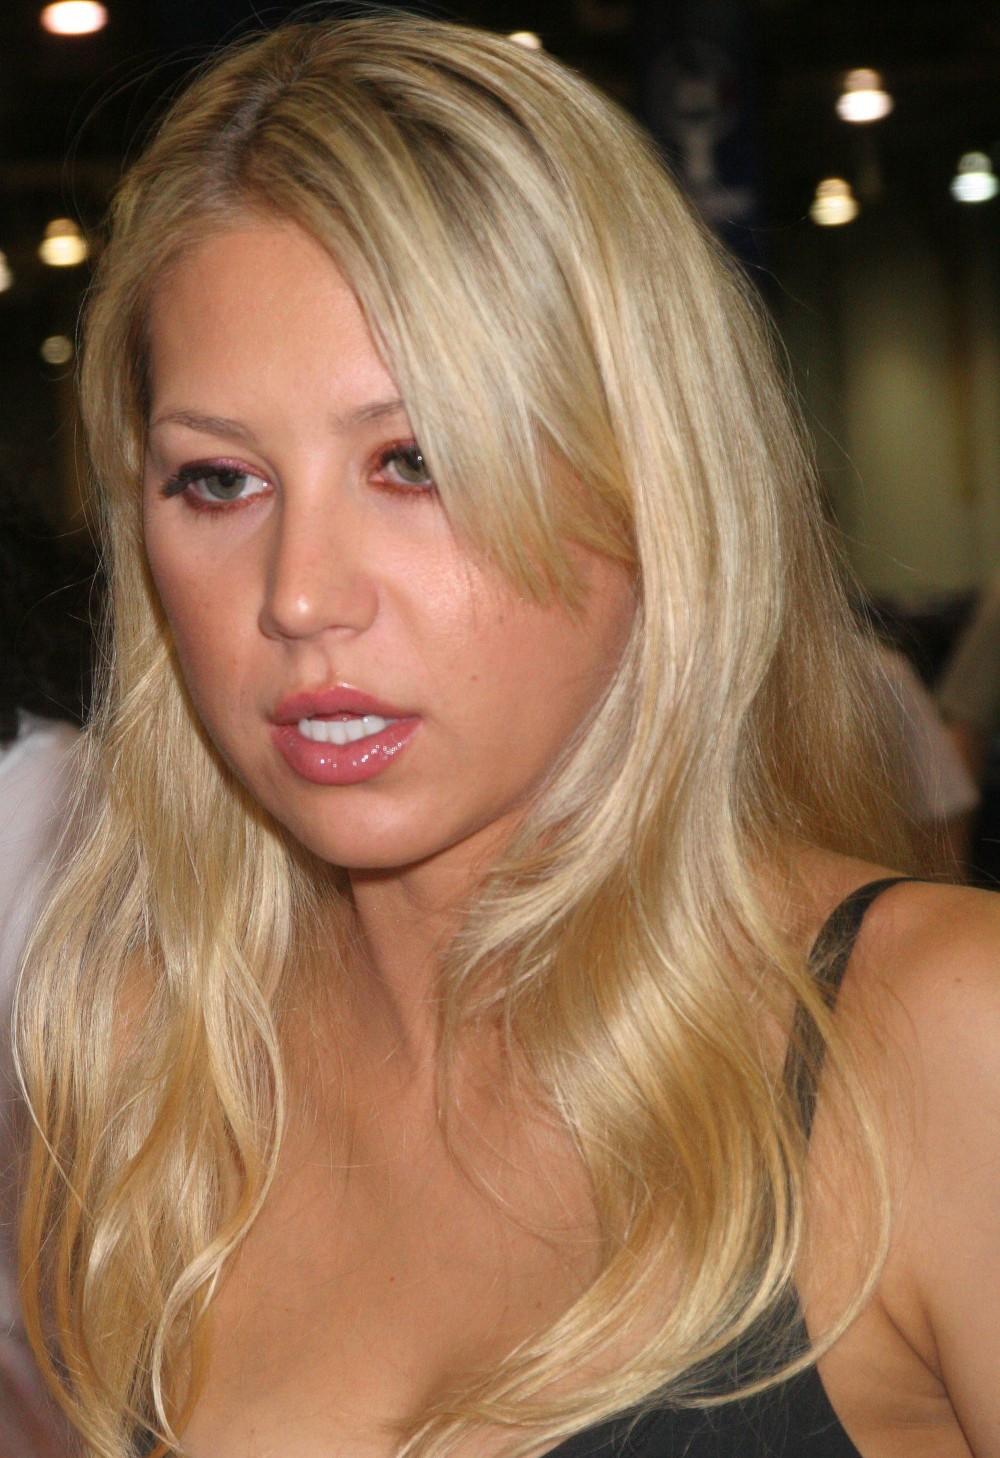 Pictures Of Hair Styles: Anna Kournikova Hairstyle